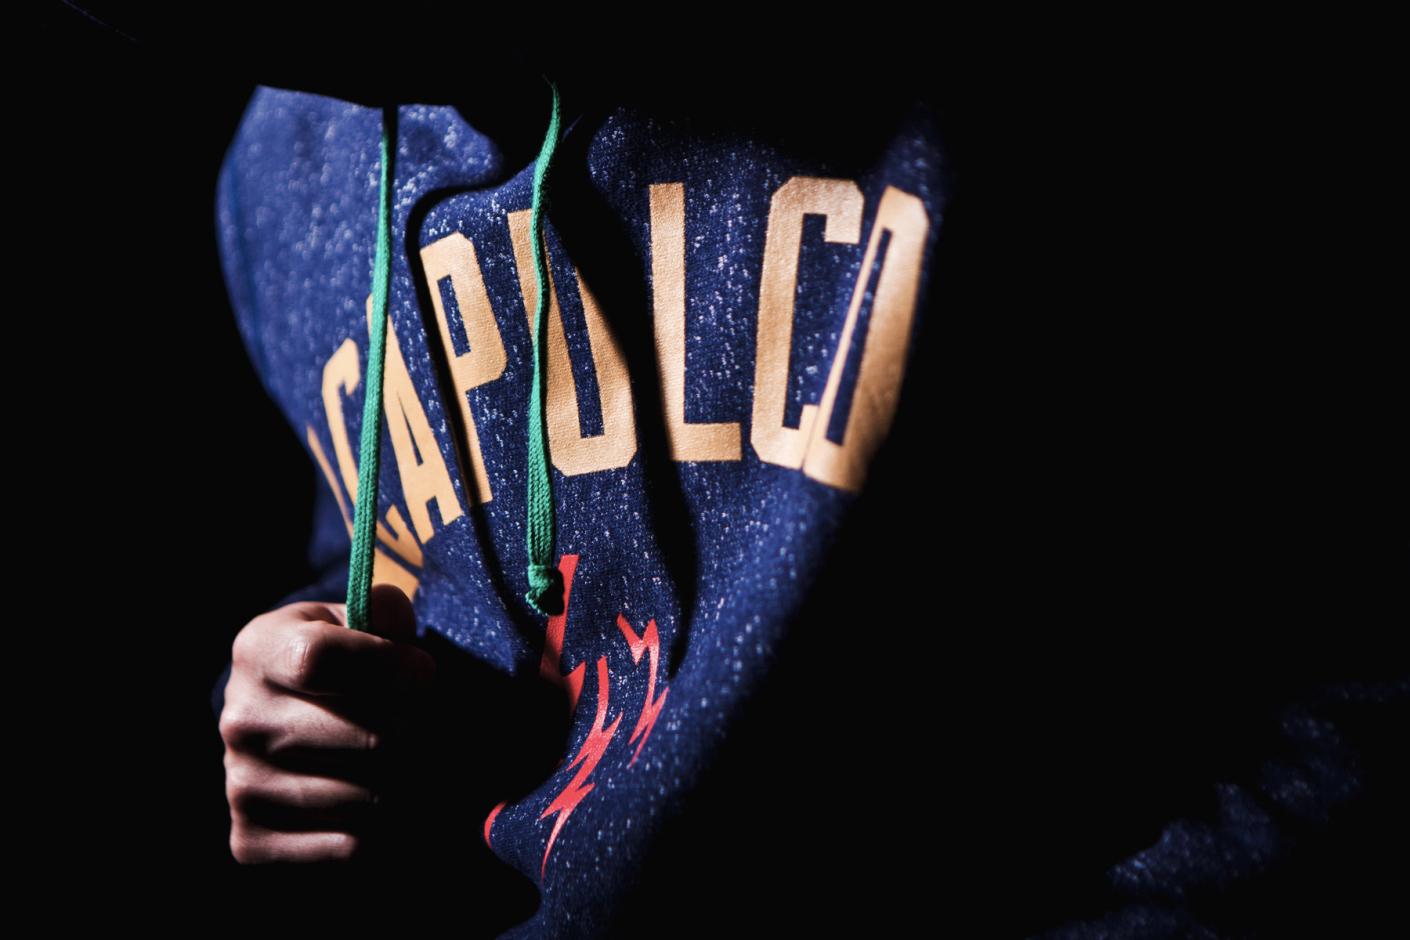 acapulco-gold-2013-fallwinter-new-arrivals-3